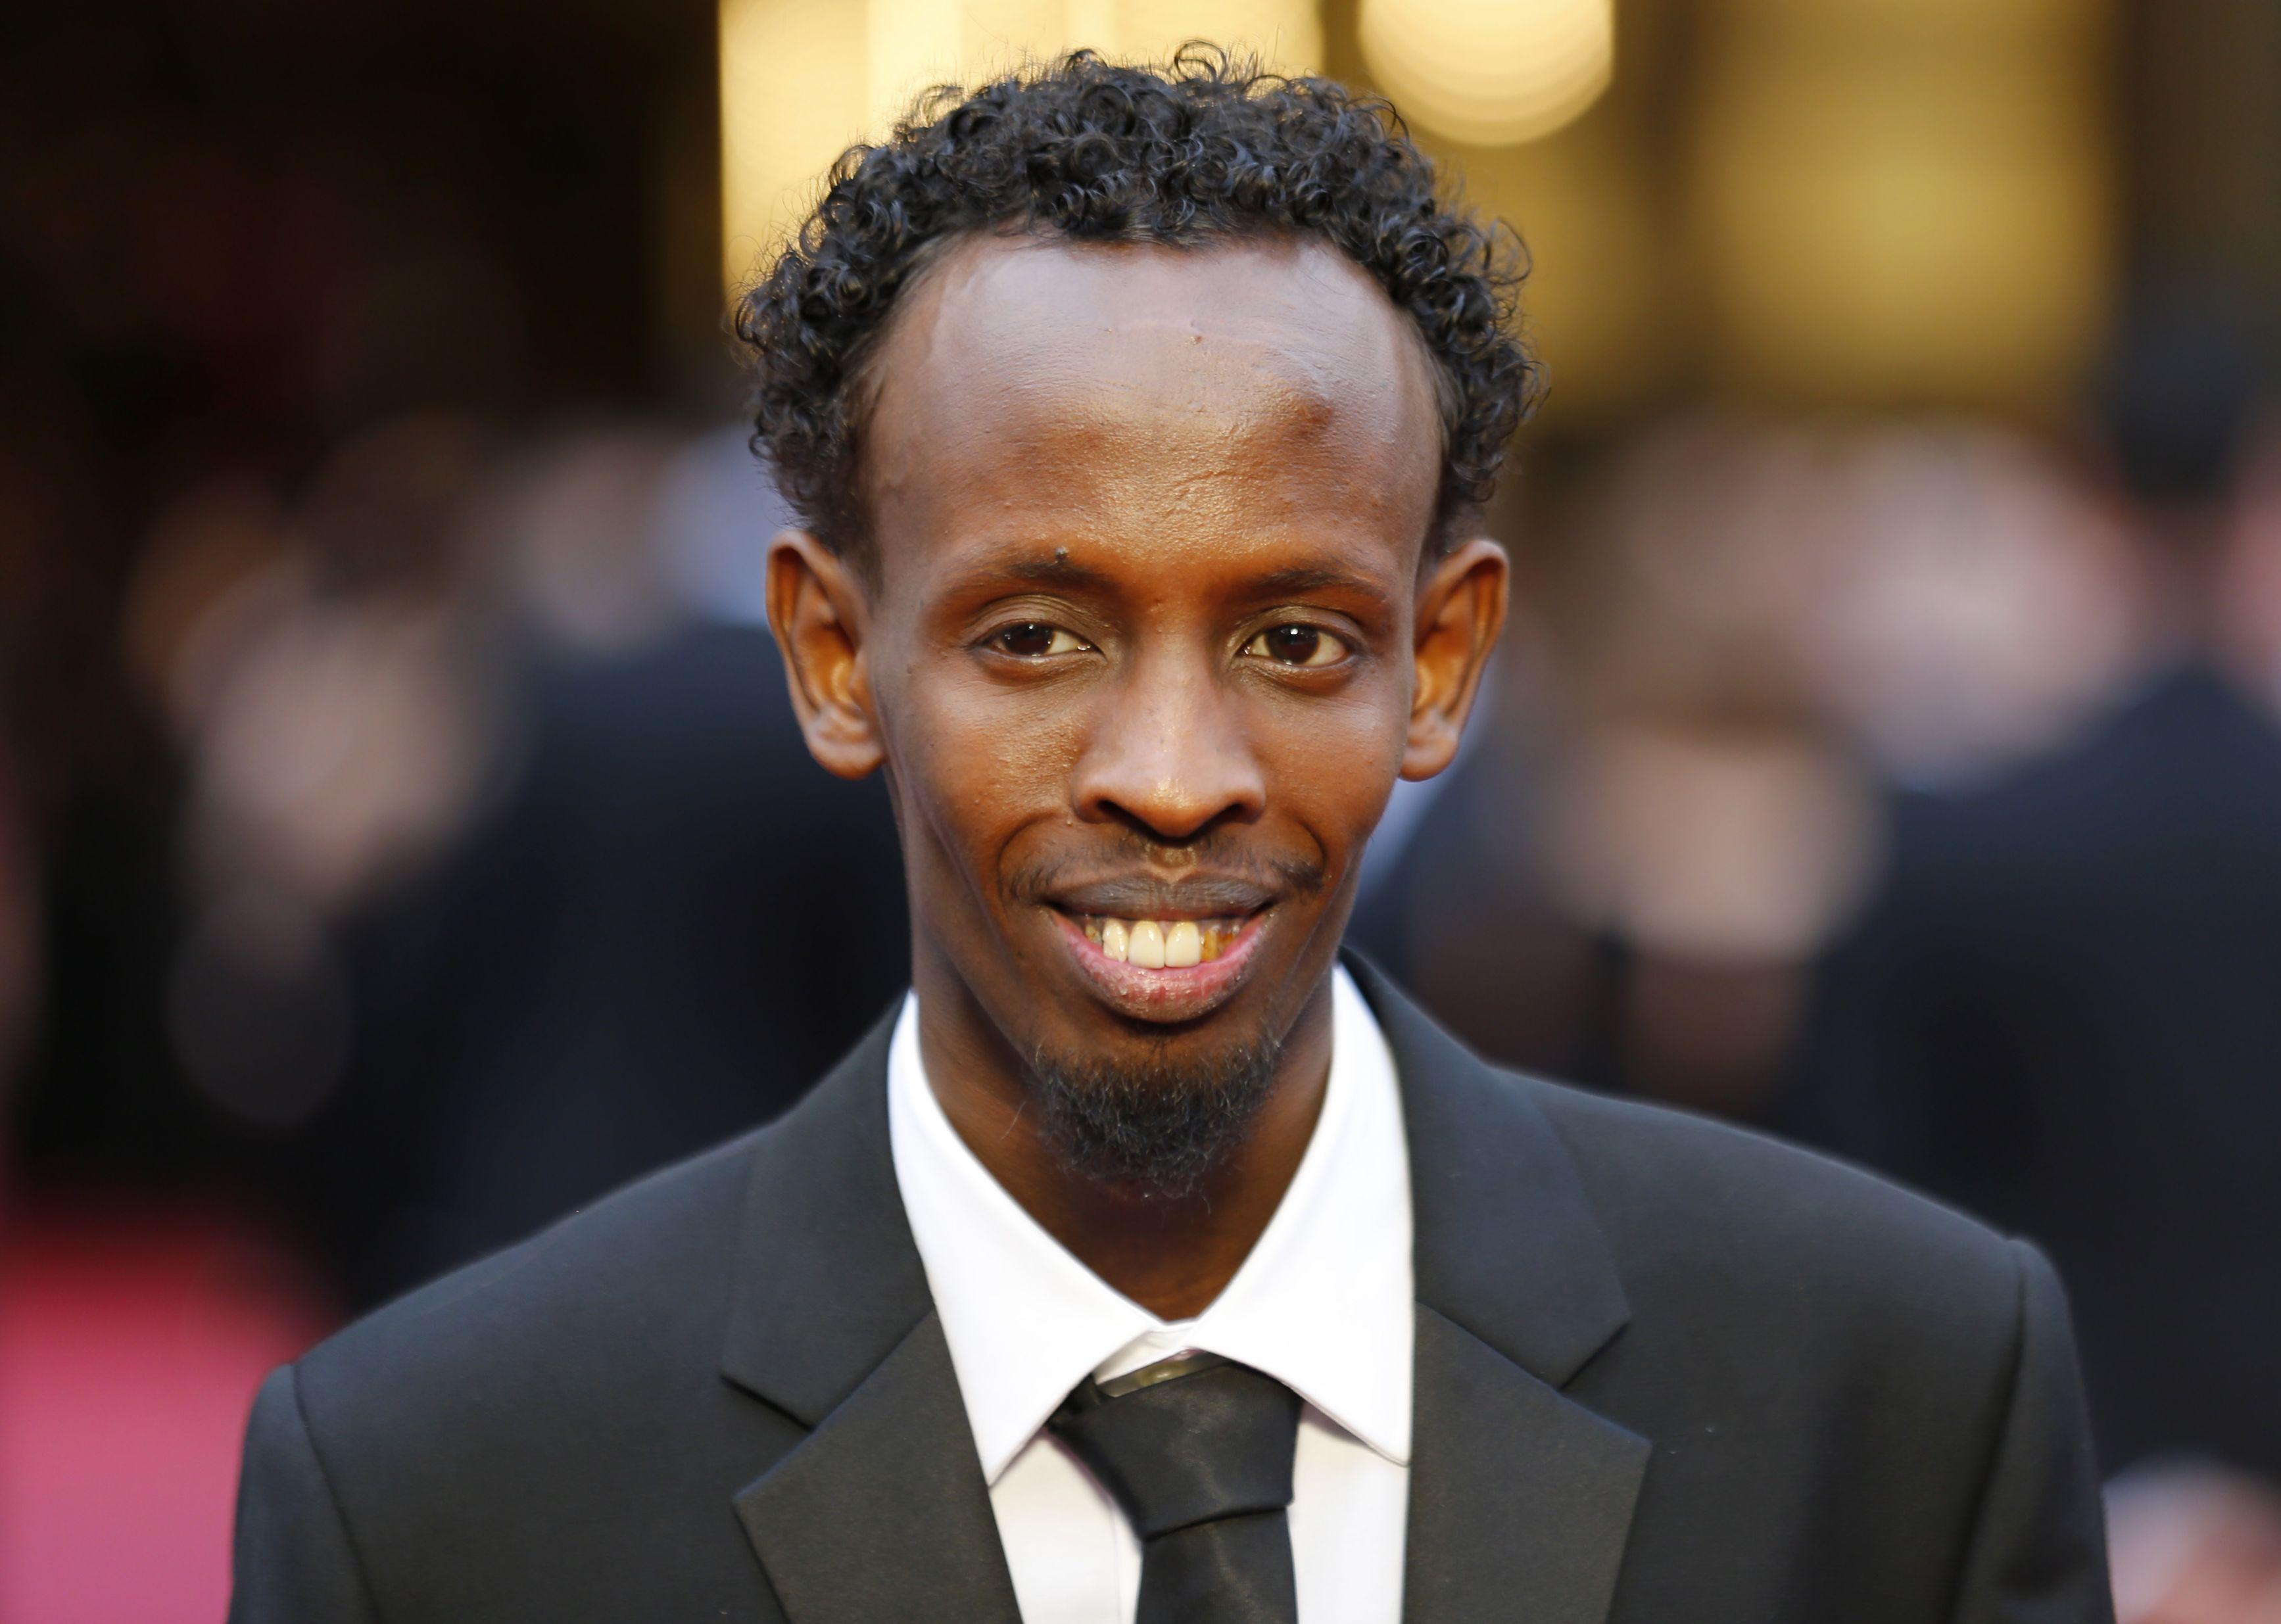 Barkhad Abdi joins Blade Runner 2